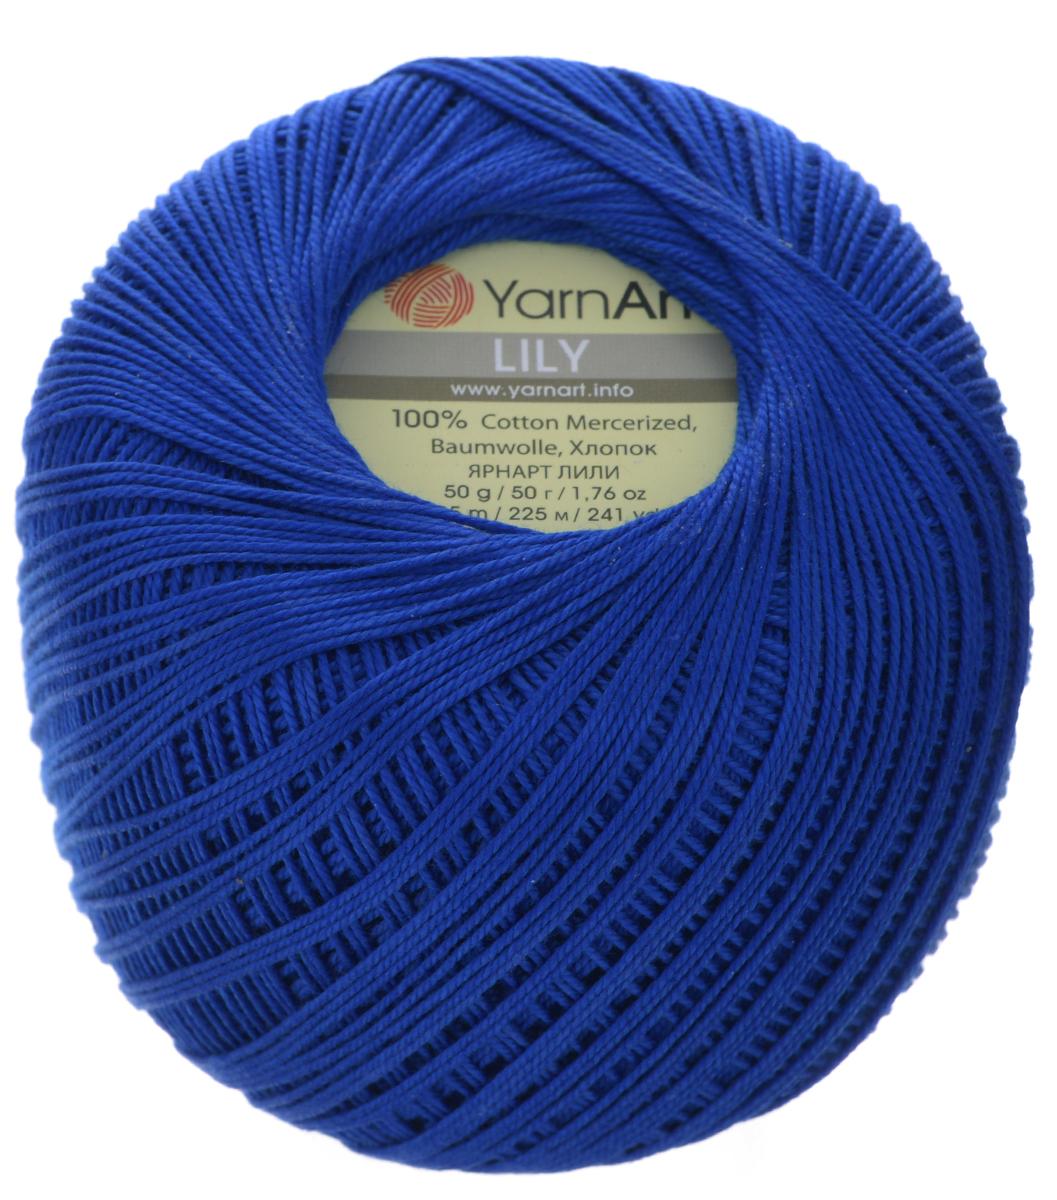 Пряжа для вязания YarnArt Lily, цвет: василек (4915), 225 м, 50 г, 8 шт пряжа для вязания yarnart baby color цвет белый черный 273 150 м 50 г 5 шт